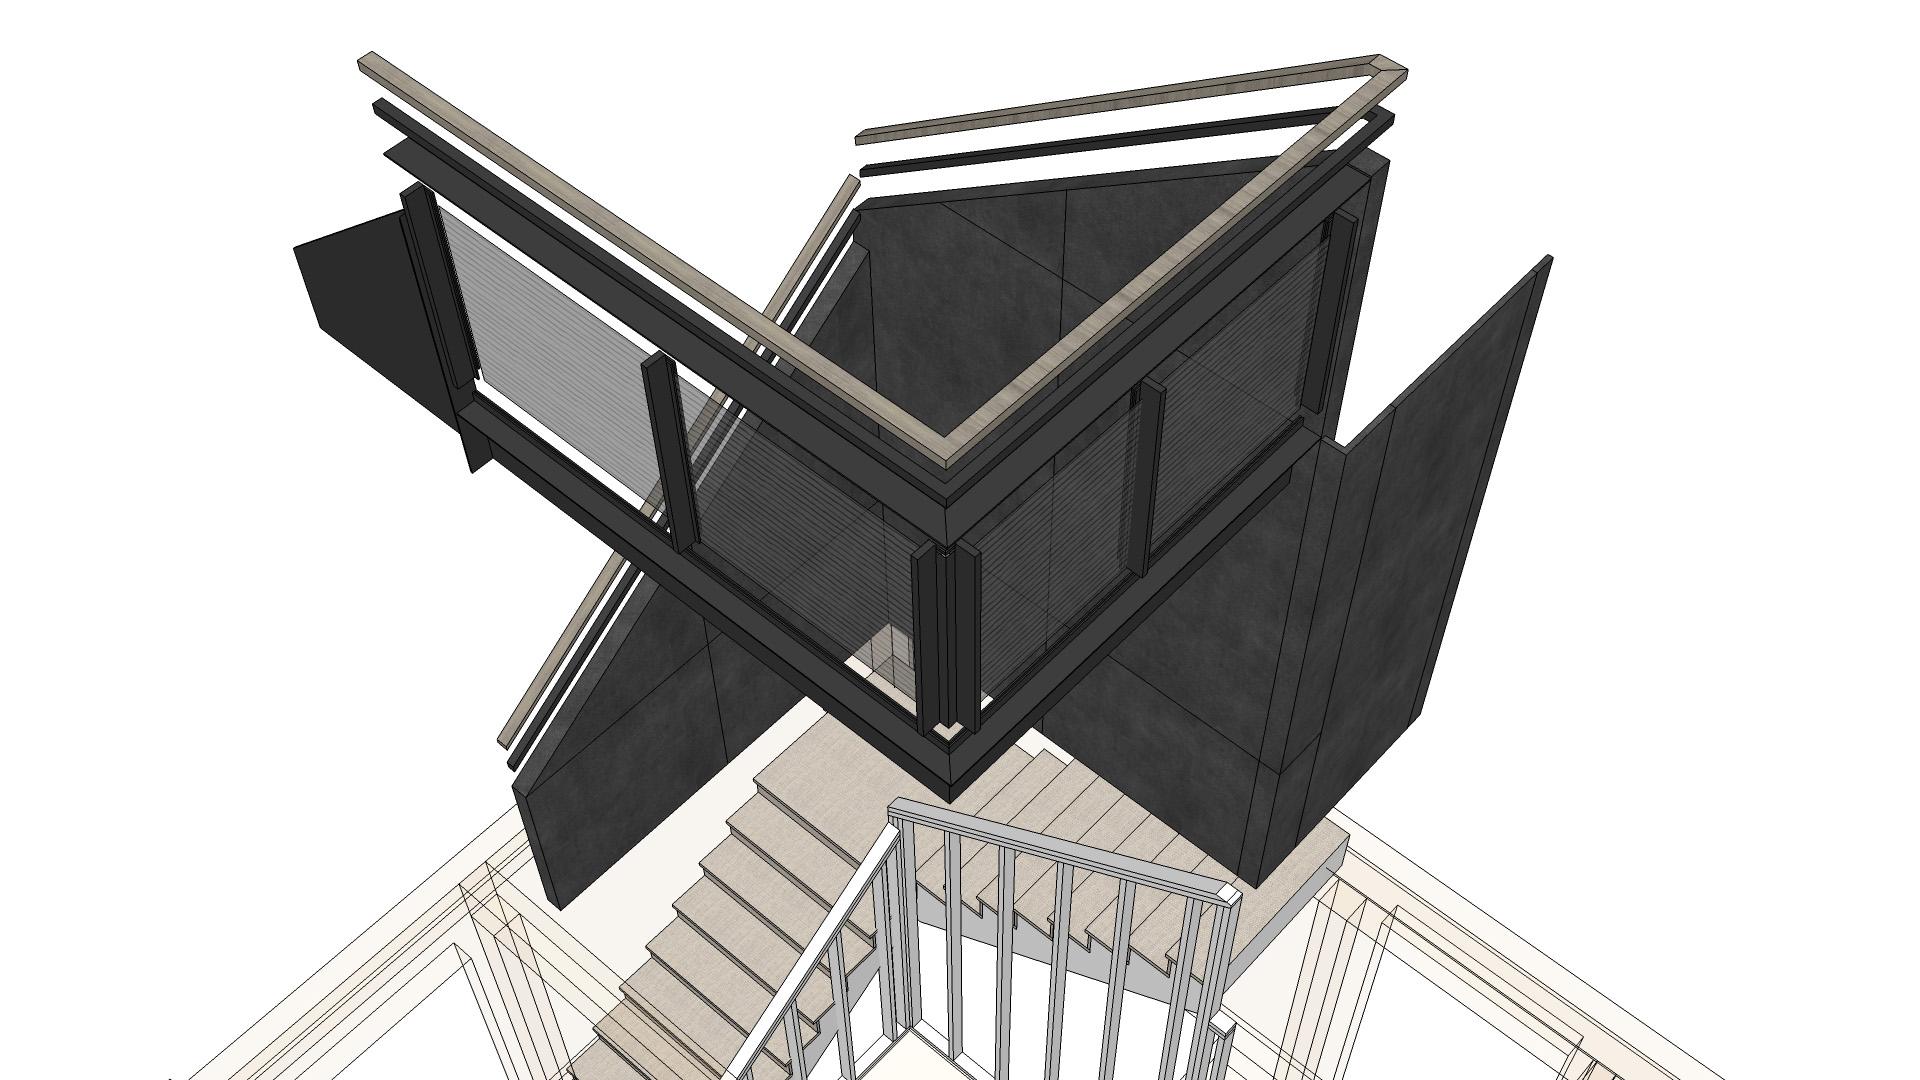 Scandinavian Rustic Cabin - Stair Axon